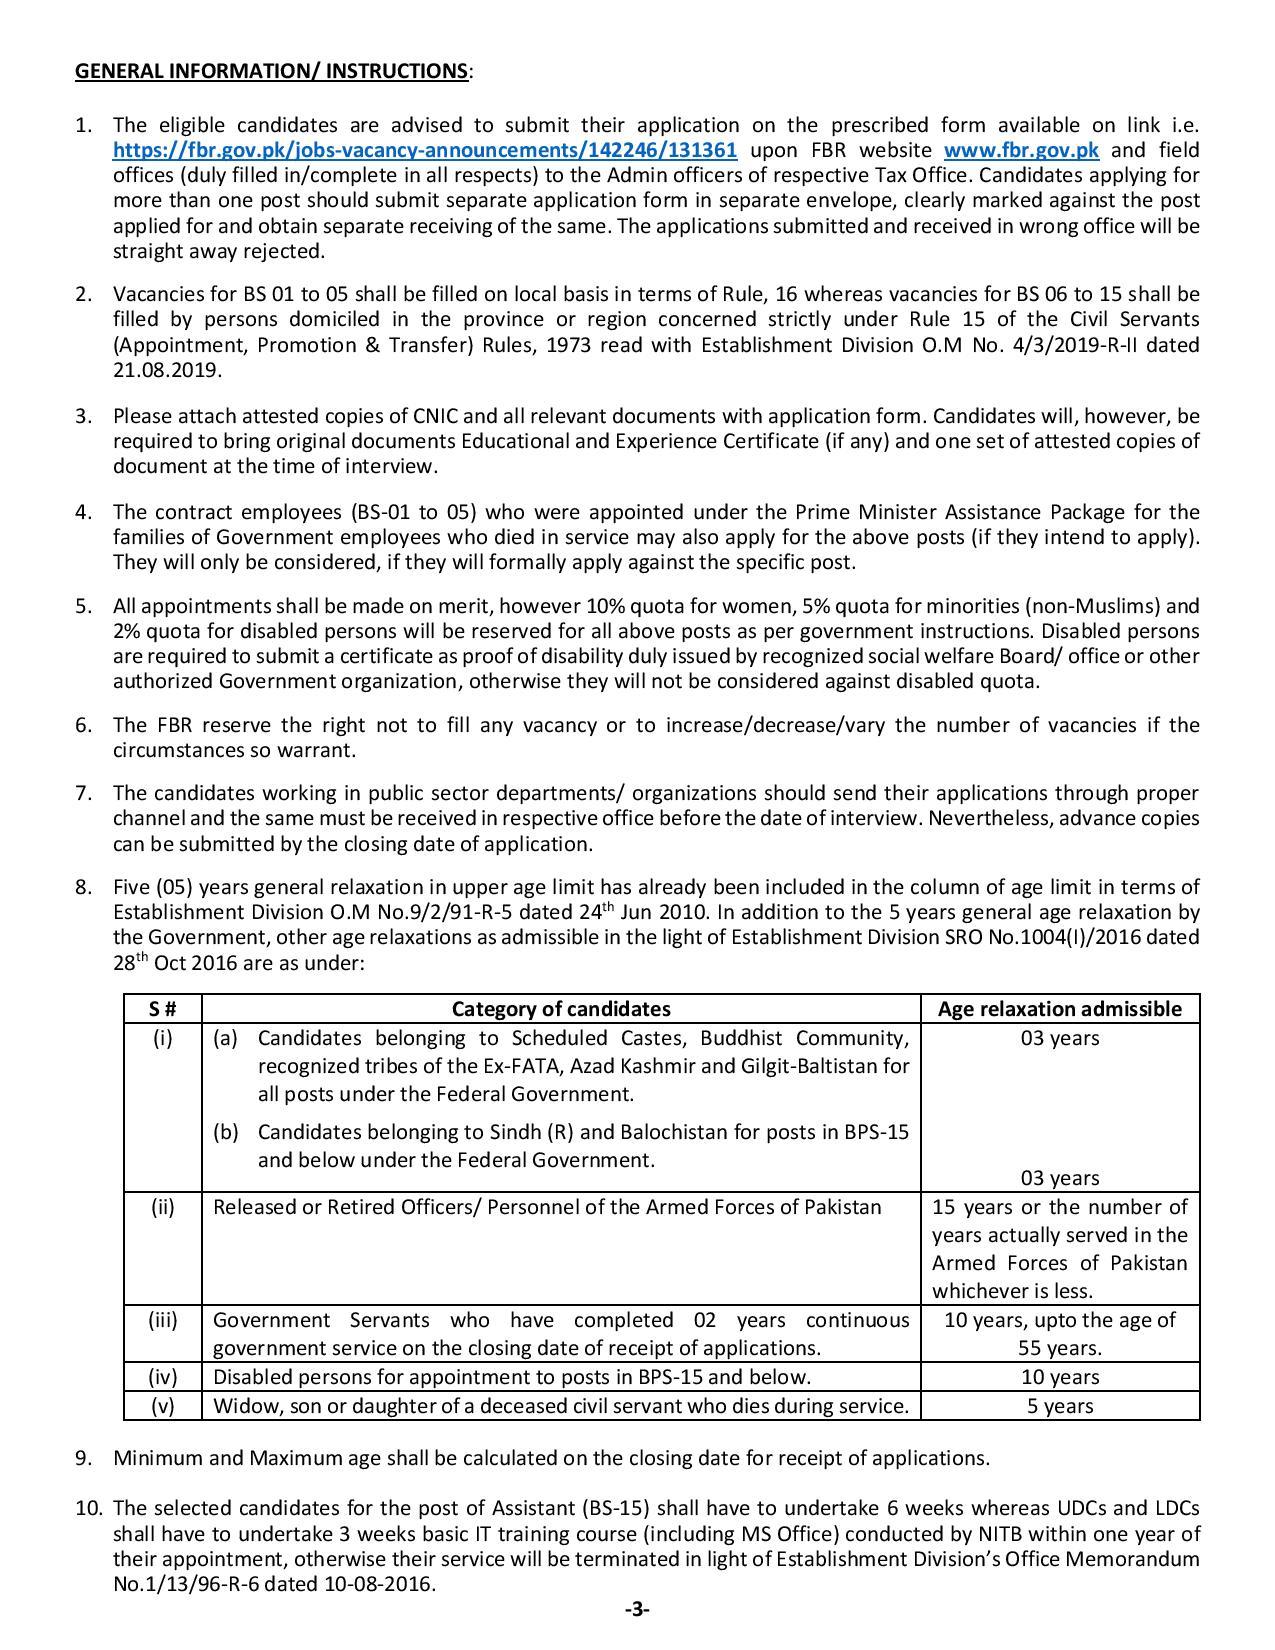 Federal Board of Revenue FBR Jobs 2021-Download Application Form